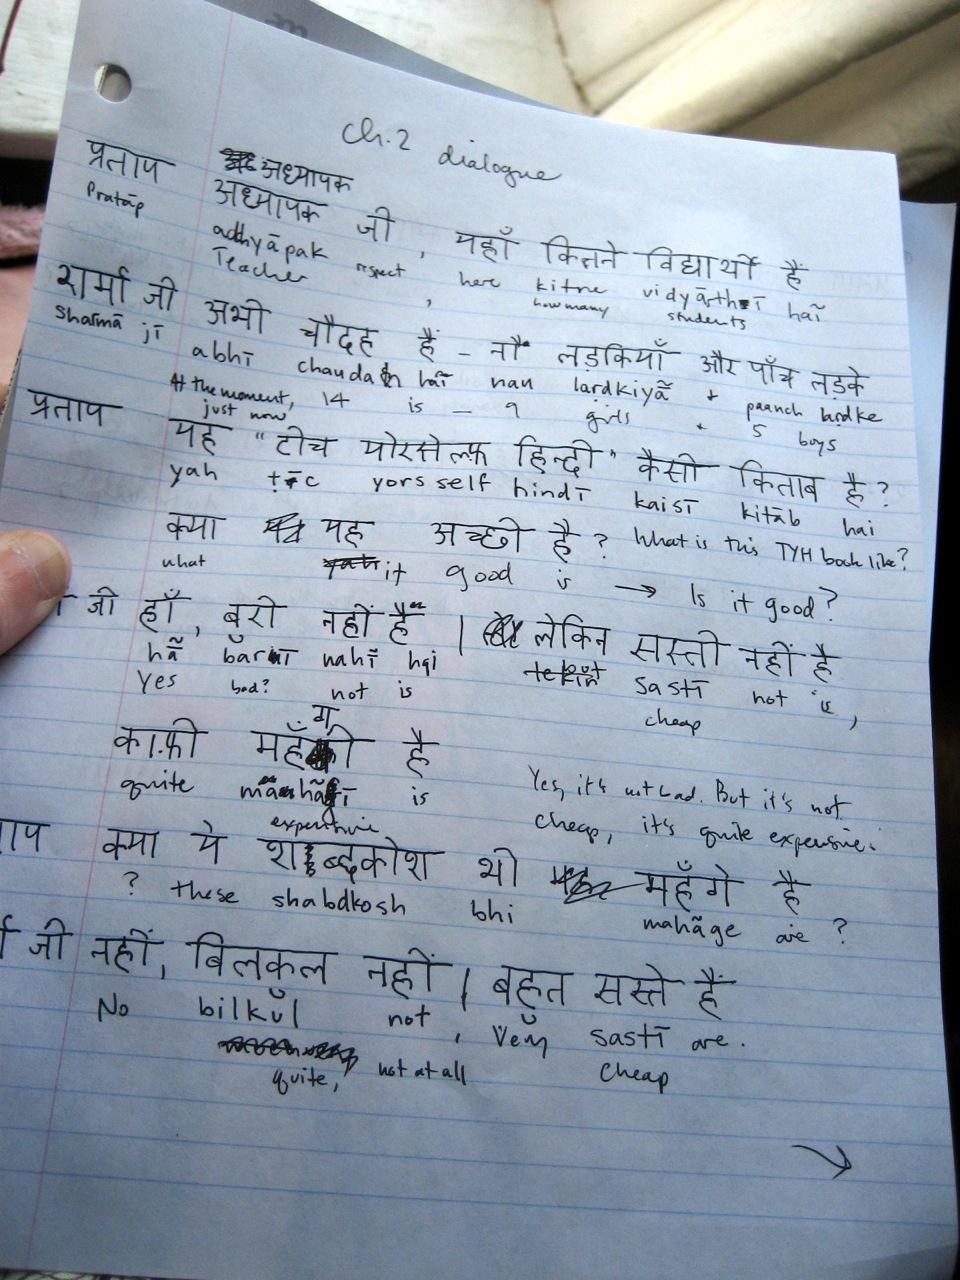 solo play script in hindi